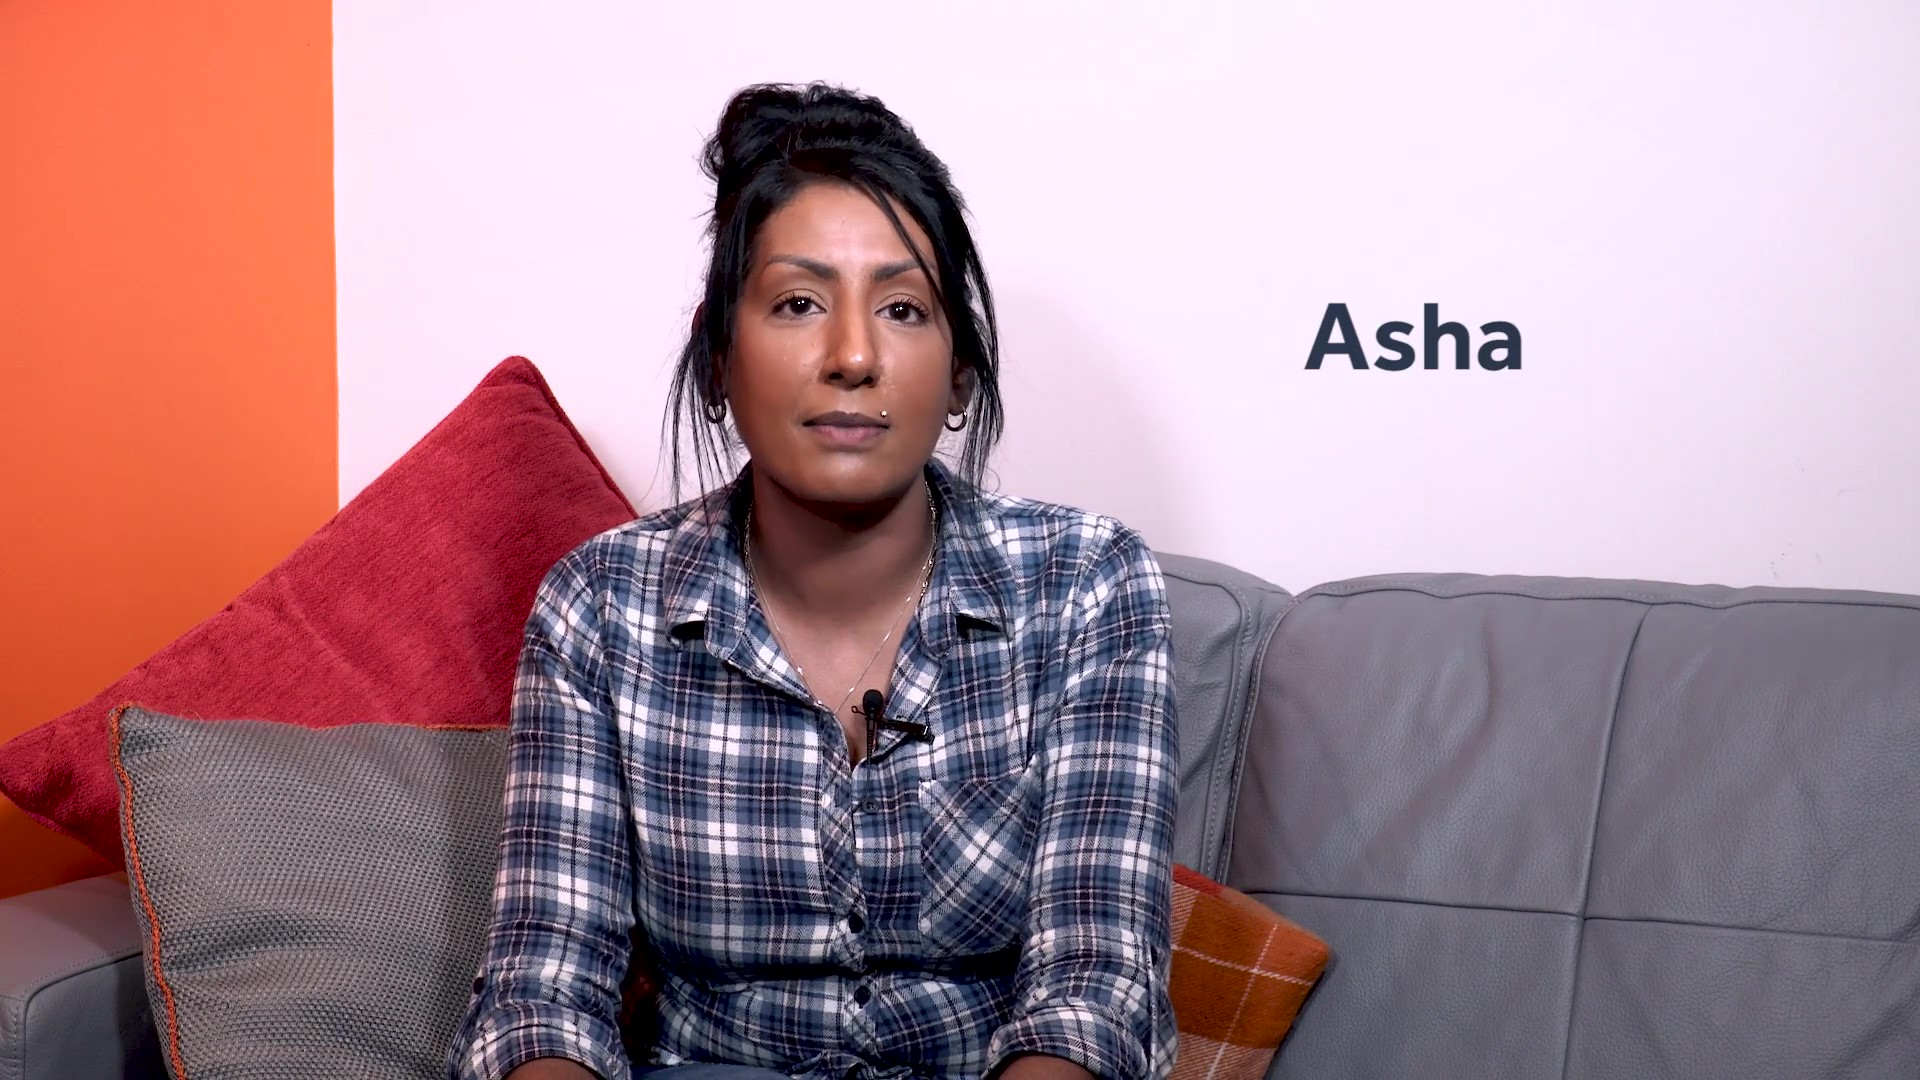 Asha's Story